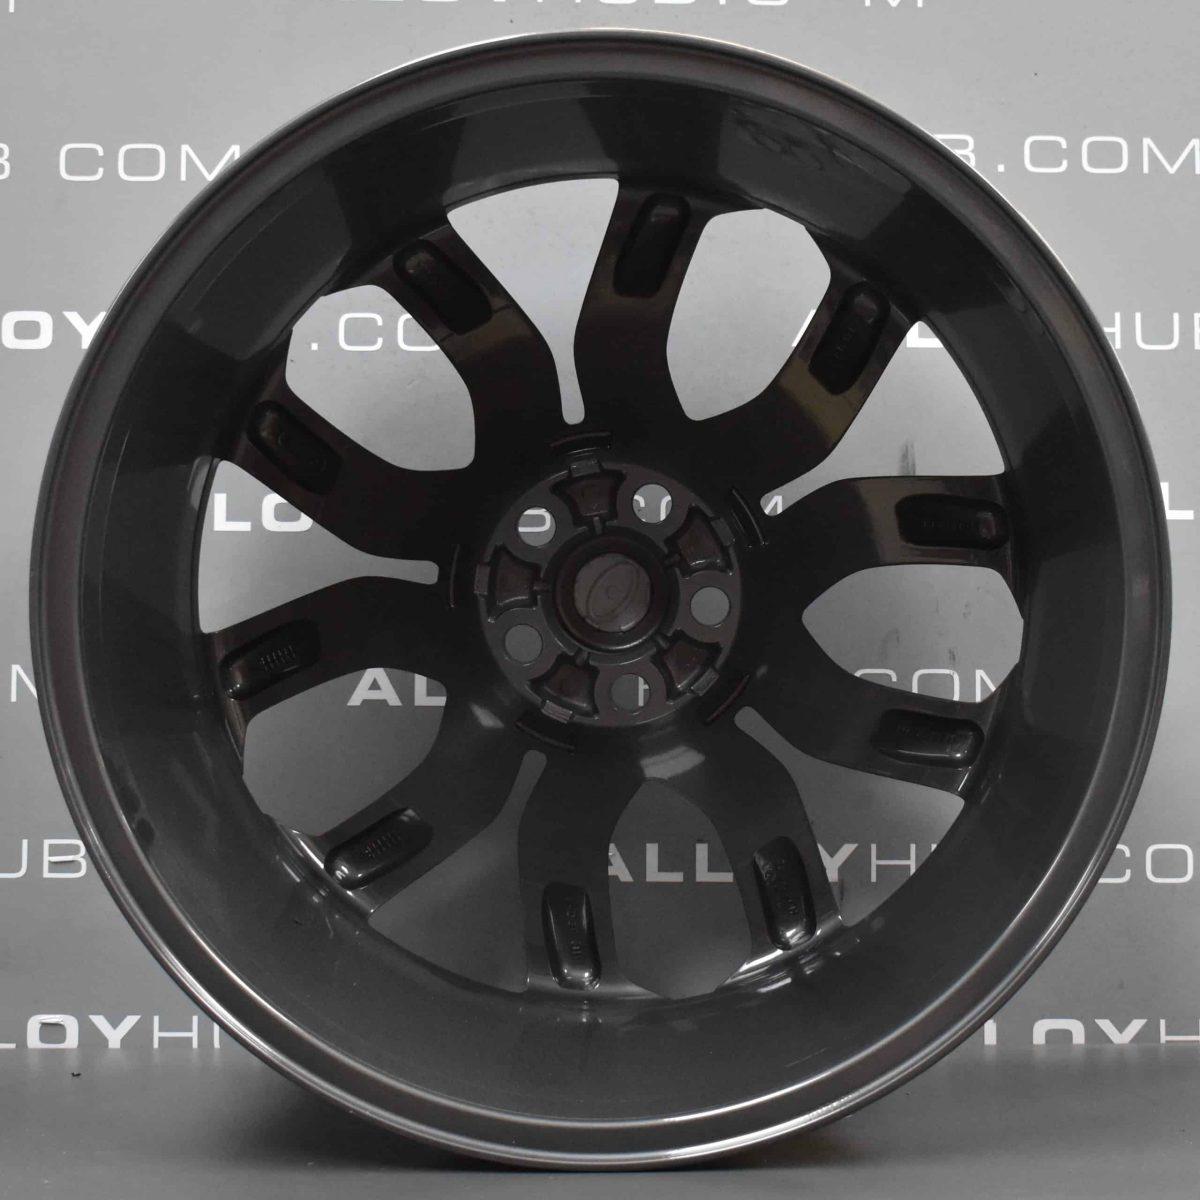 "Genuine Range Rover Evoque L538 20"" inch Style 5004 5 Split-Spoke Anthracite Grey Alloy Wheels LR024425"